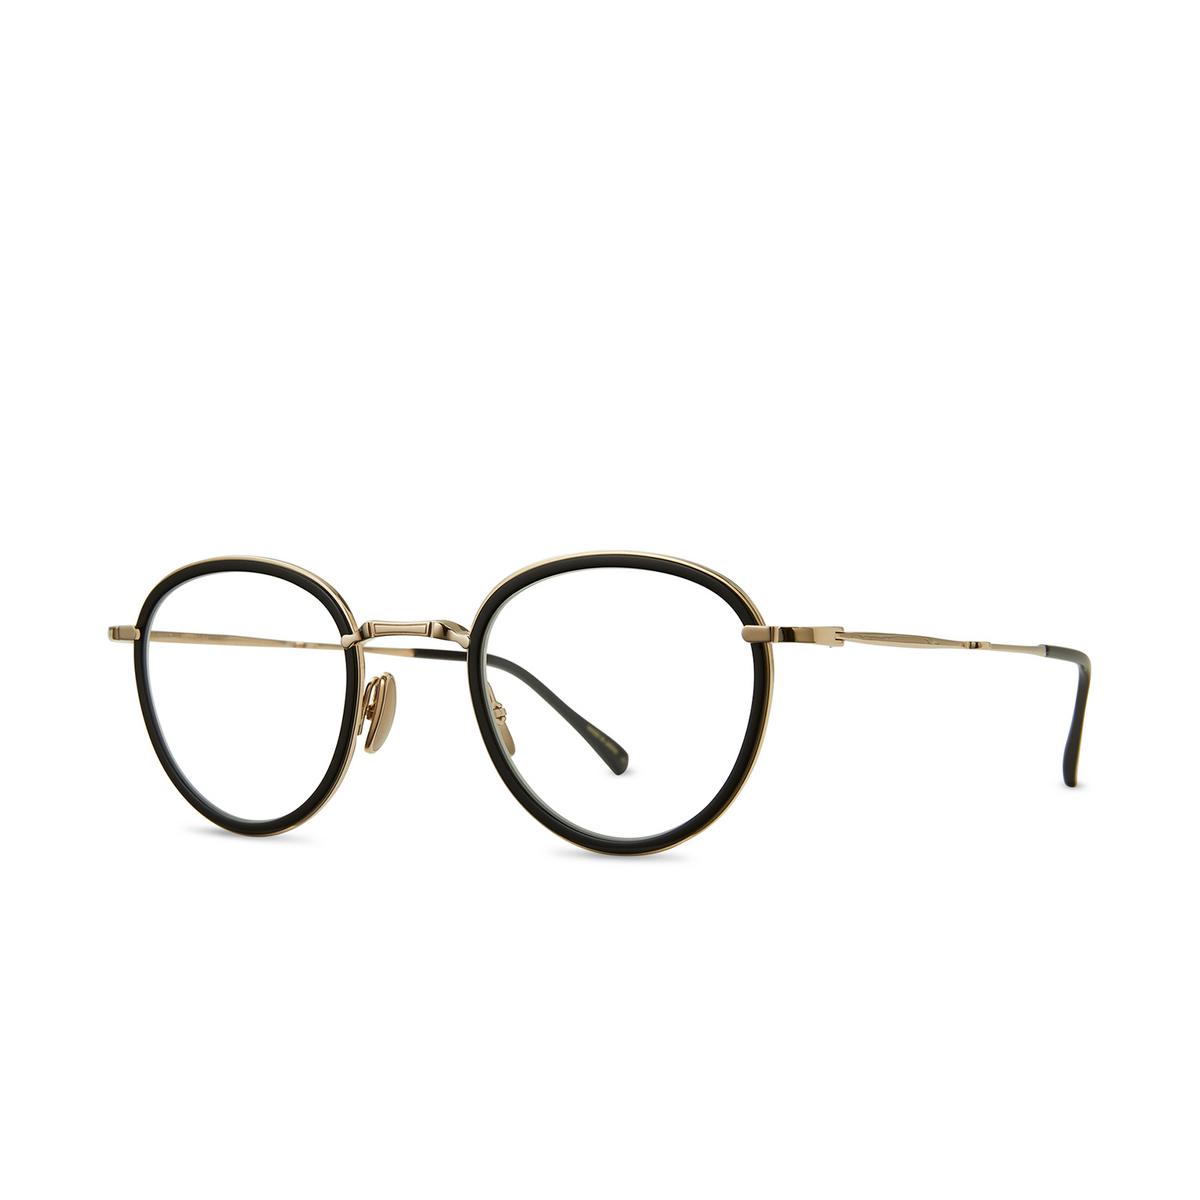 Mr. Leight® Round Eyeglasses: Mulholland C color BK-12KWG-BK - three-quarters view.